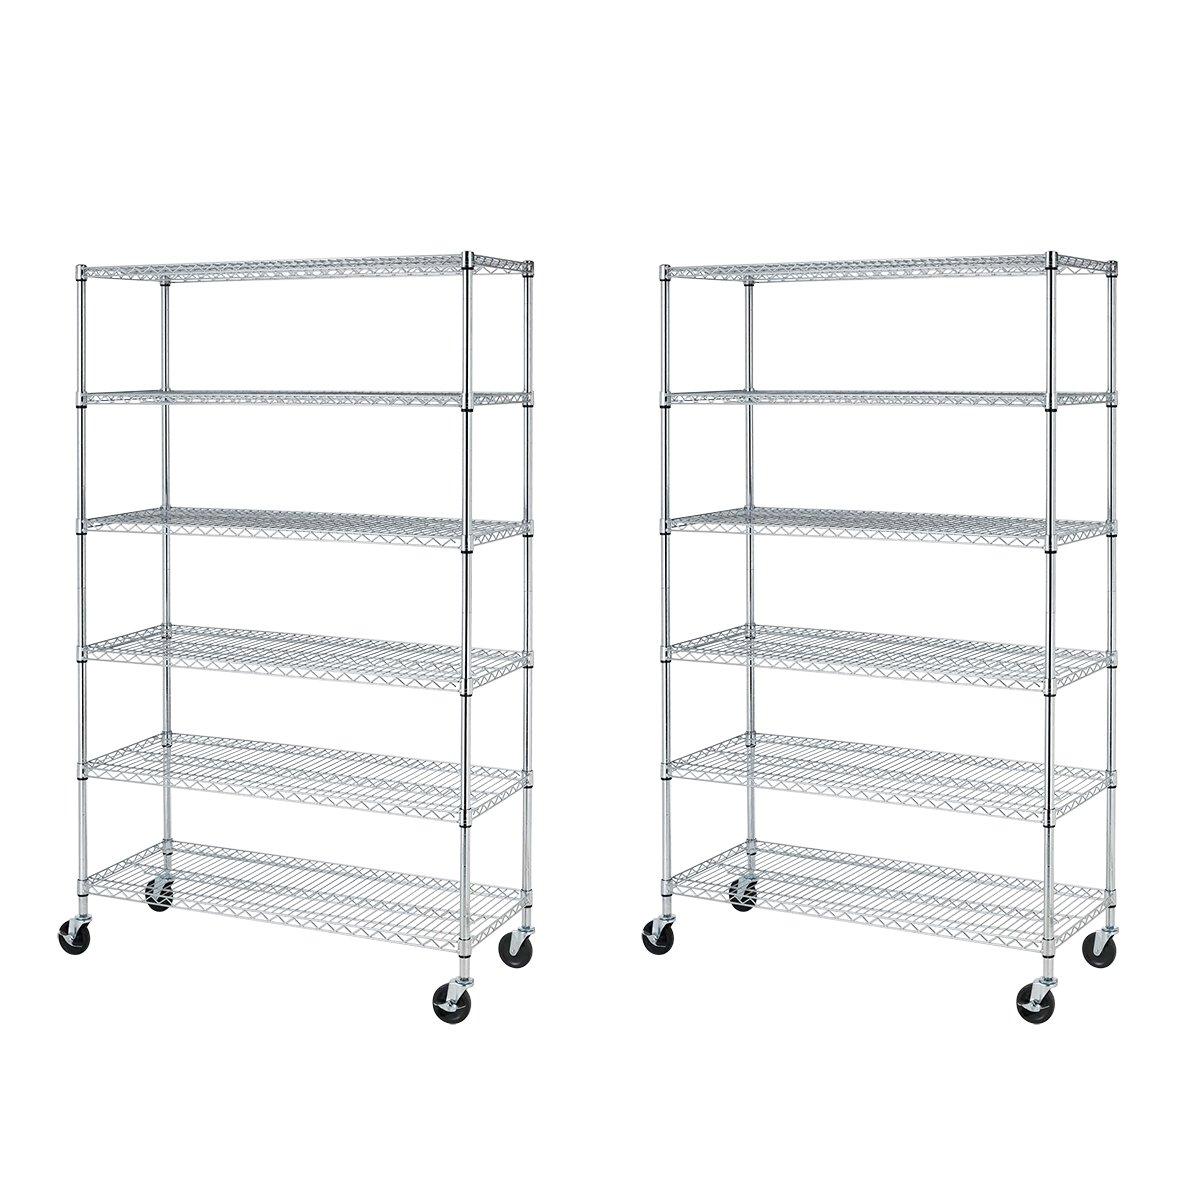 82''x48''x18'' 6 Tier Layer Shelf Adjustable Wire Metal Shelving Rack,Chrome (2)